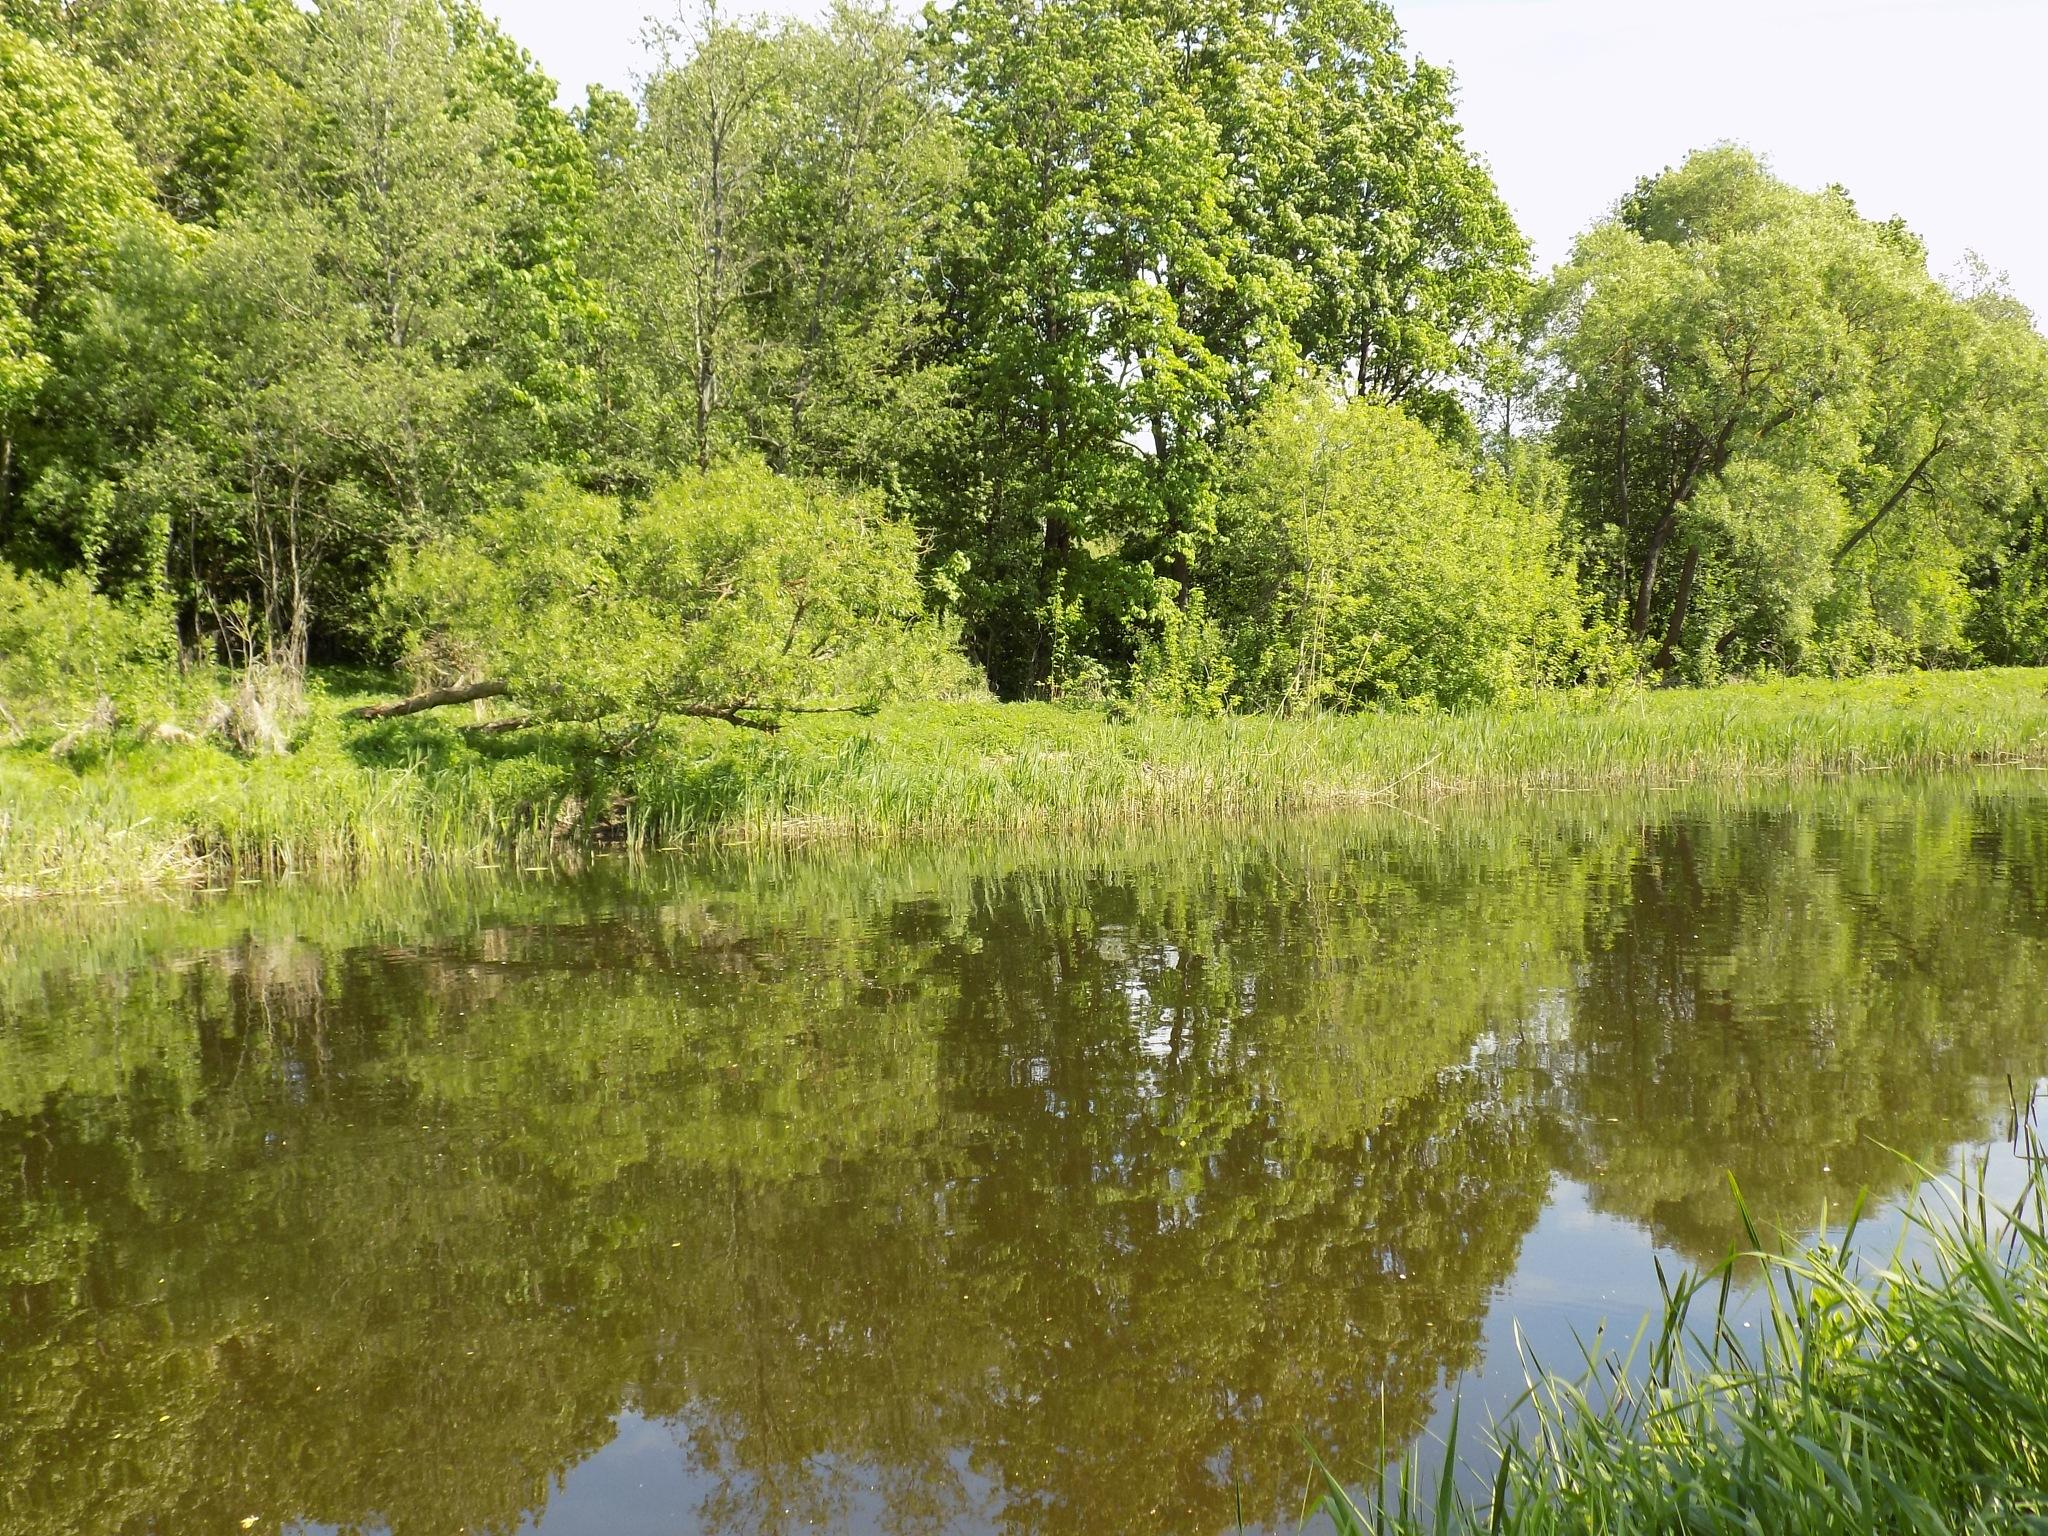 Green summer by uzkuraitiene62